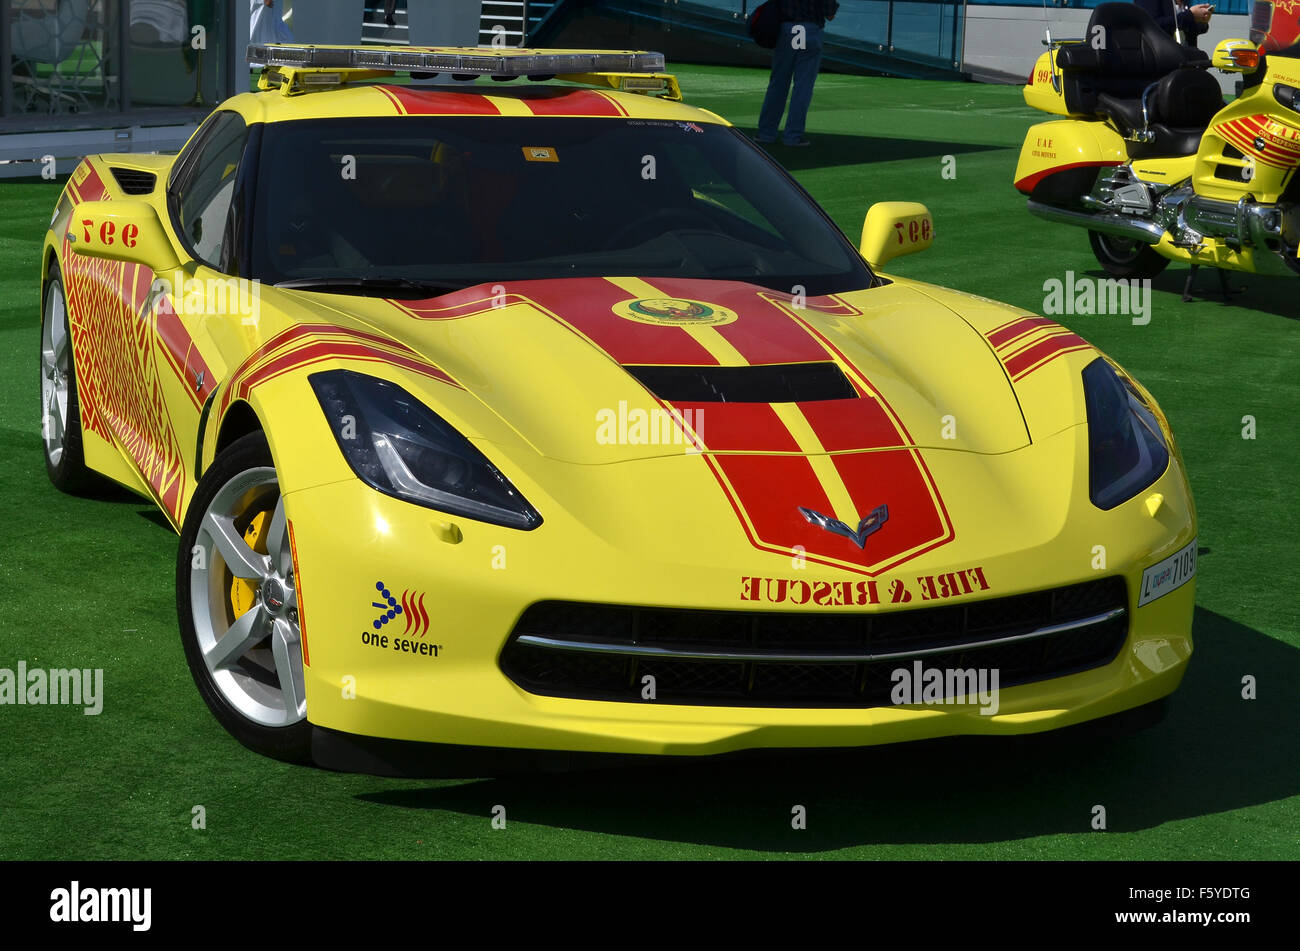 Dubai, UAE. 10th November, 2015. Hot Rod: Dubai Civil Defence are using a brght yellow V8-powered Chevrolet Corvette - Stock Image